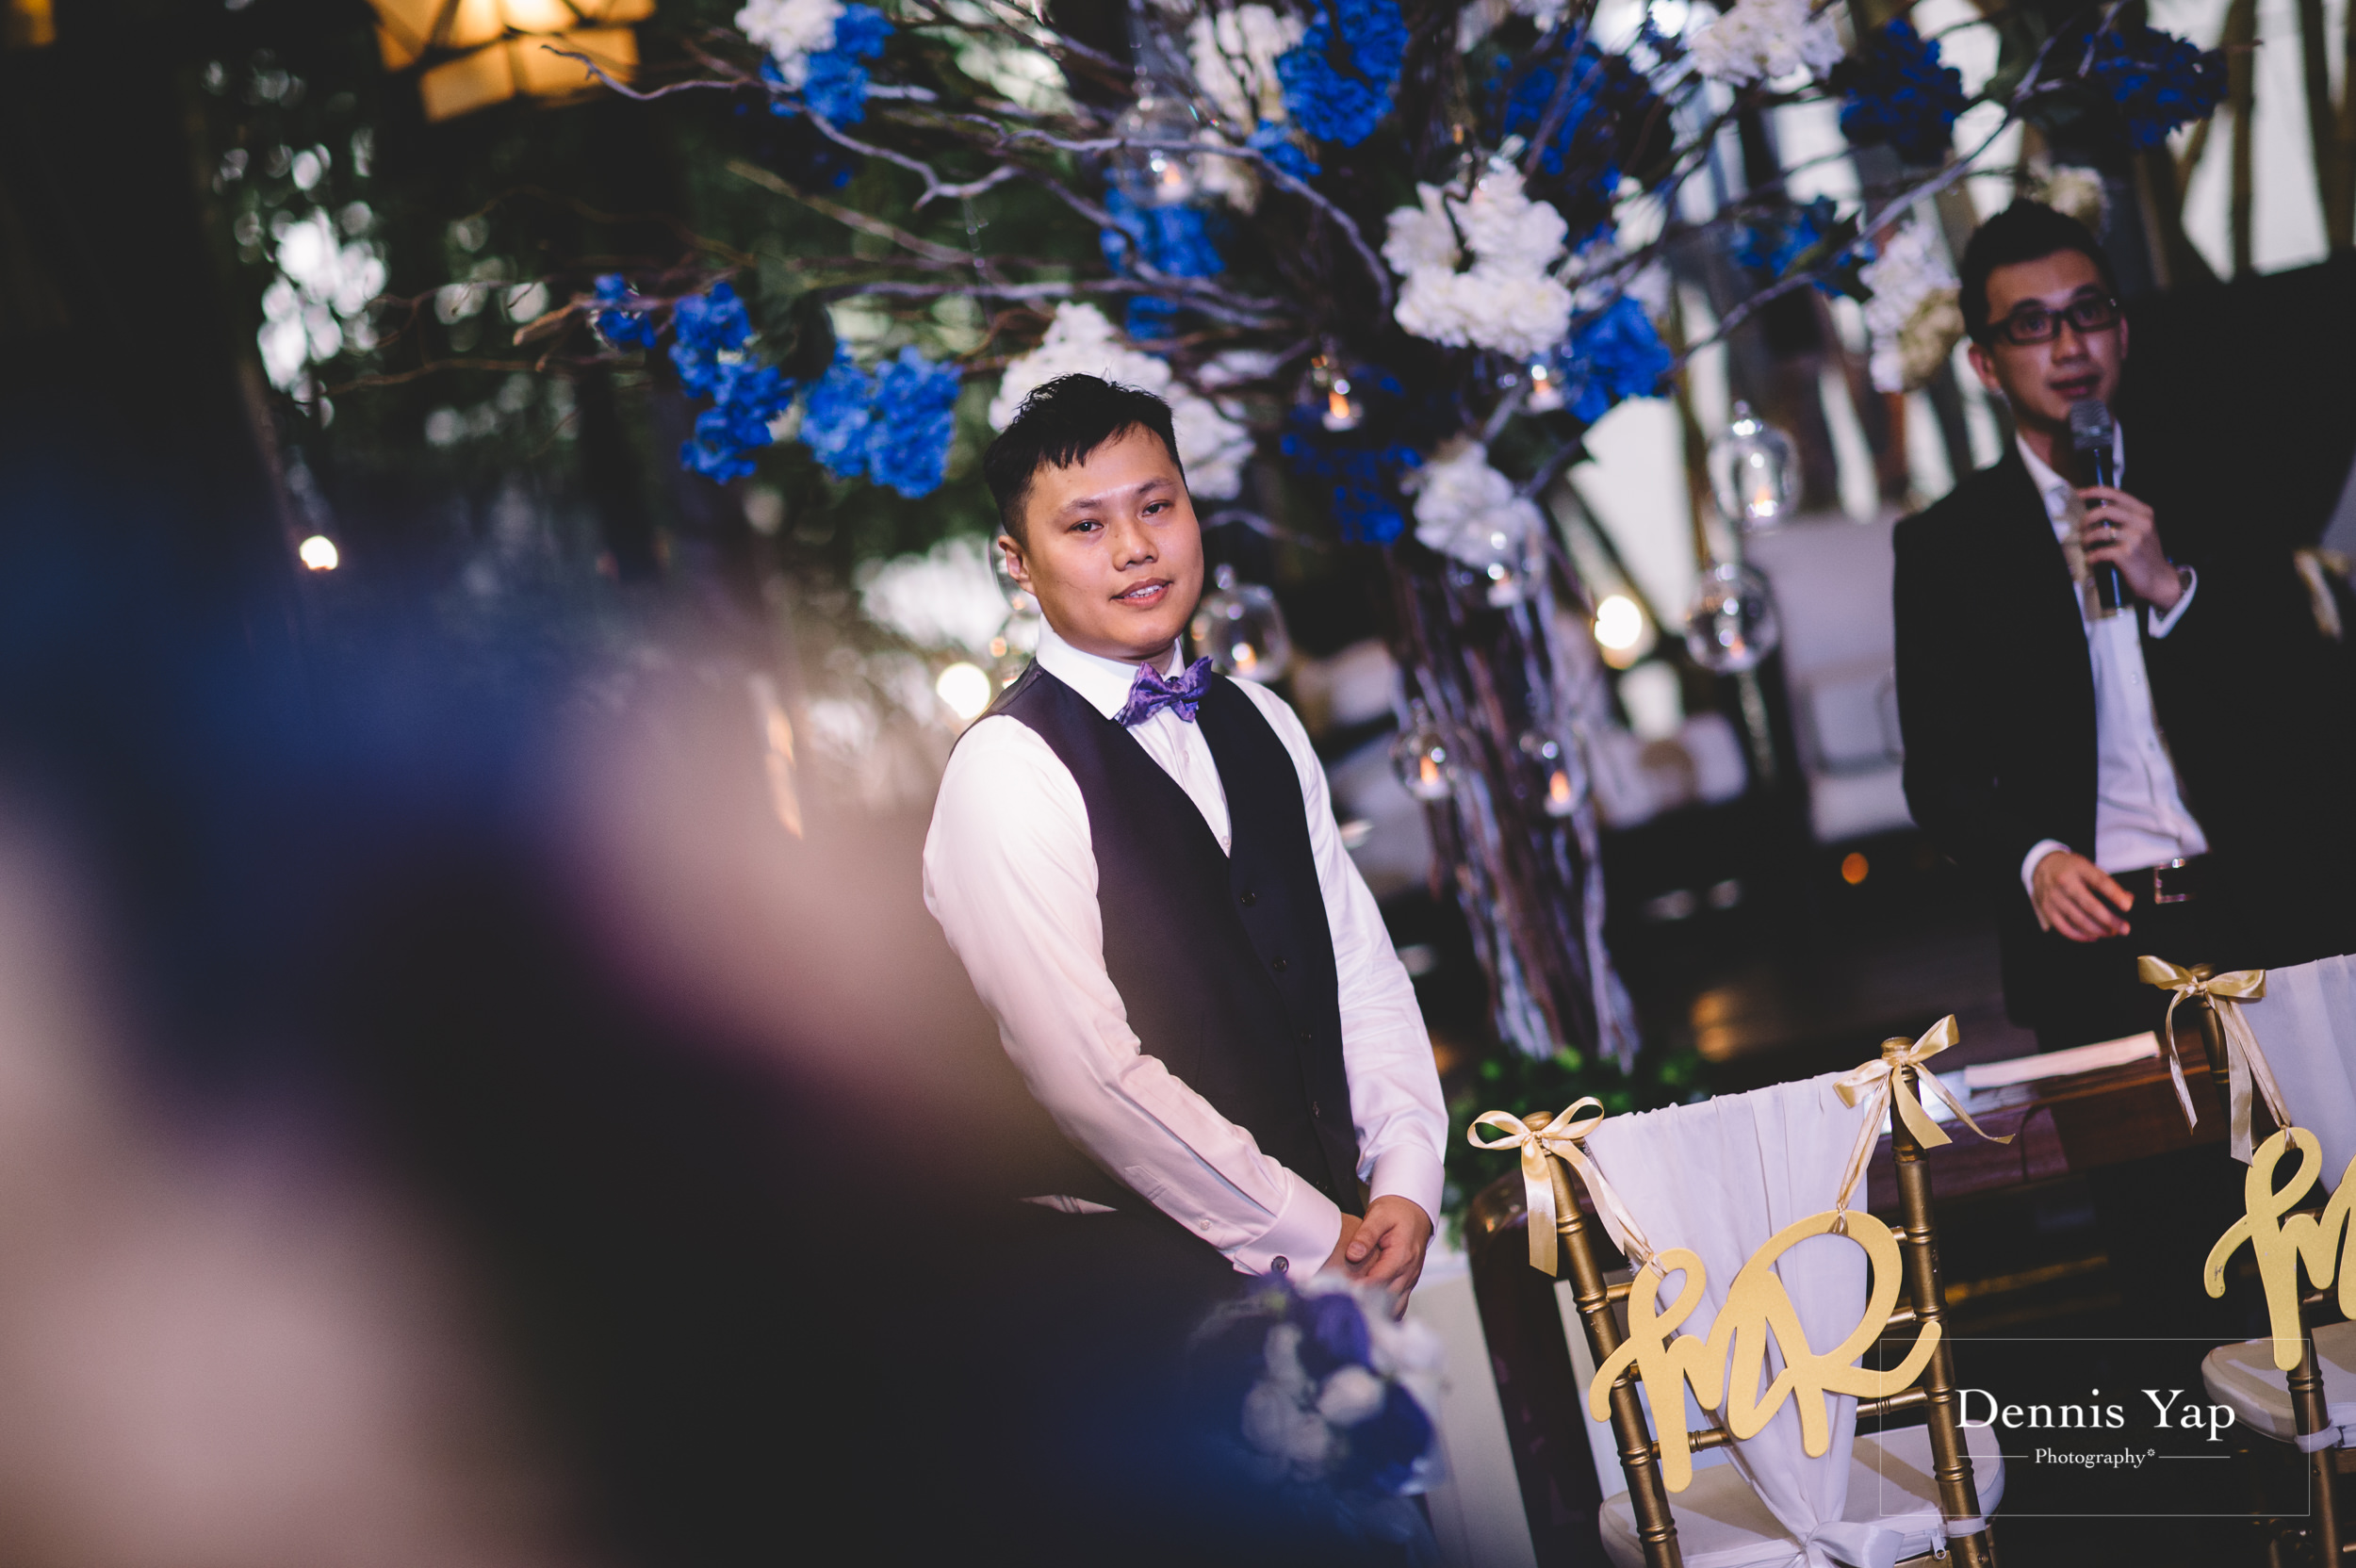 vincent peggy wedding dinner neo tamarind kuala lumpur dennis yap photography-19.jpg